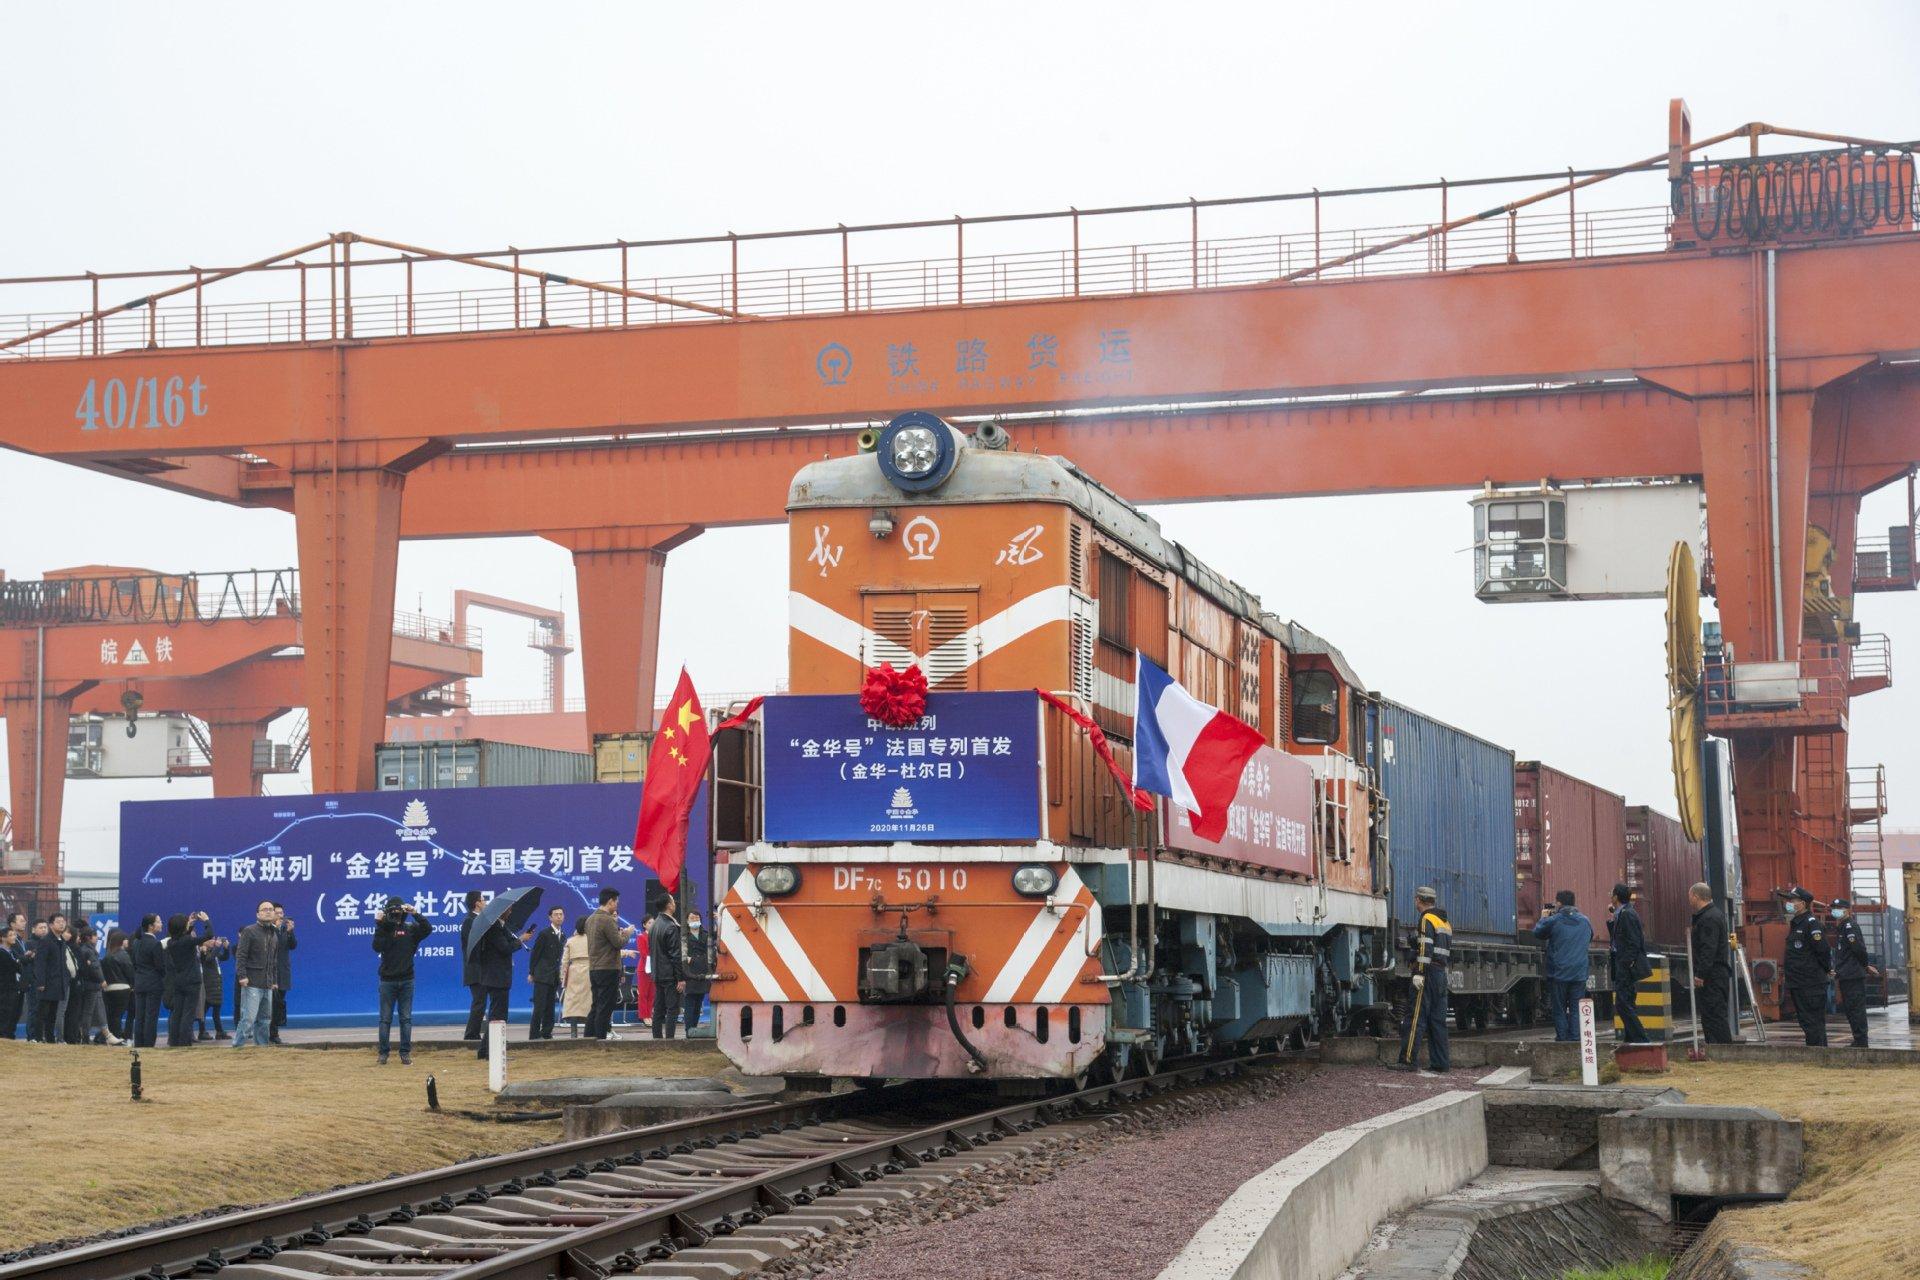 China-Europe freight trains from China's Yiwu, Zhejiang more than triple in Q1